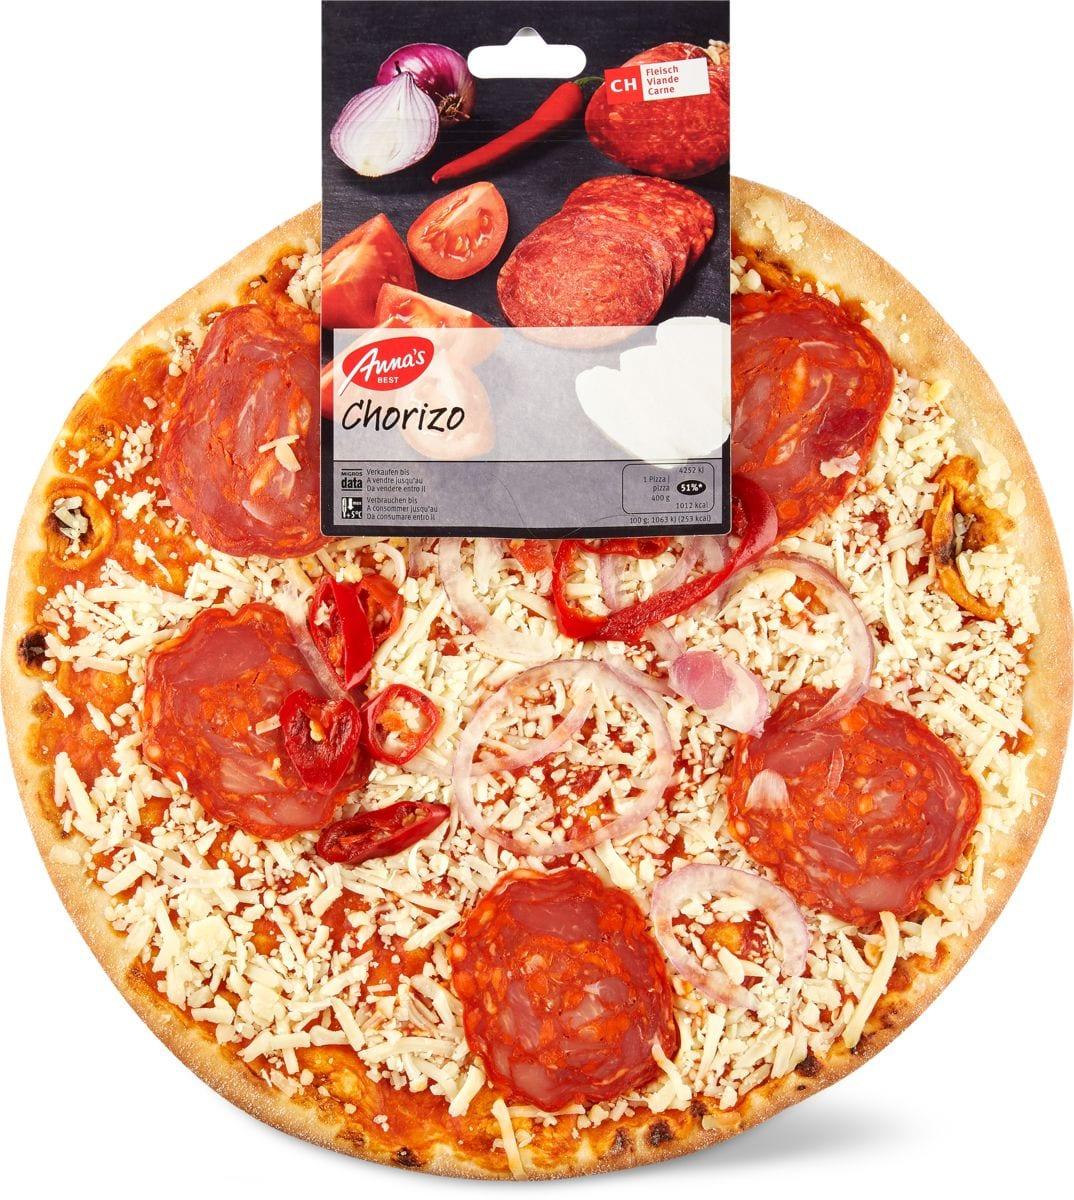 Anna's Best Pizza Chorizo